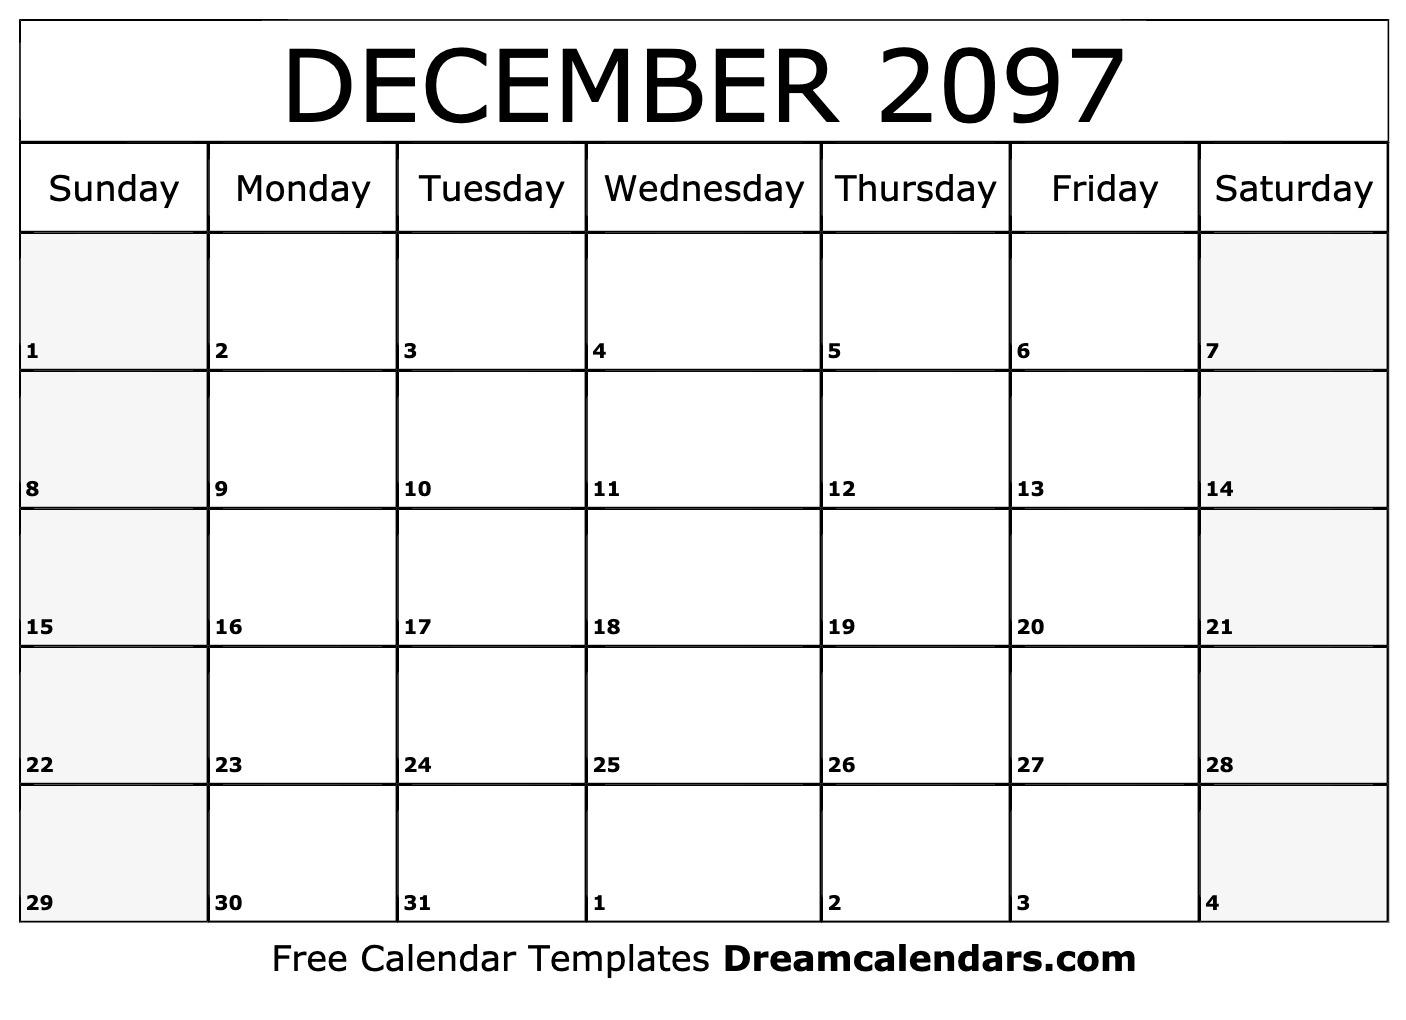 December 2097 Calendar | Free Blank Printable Templates